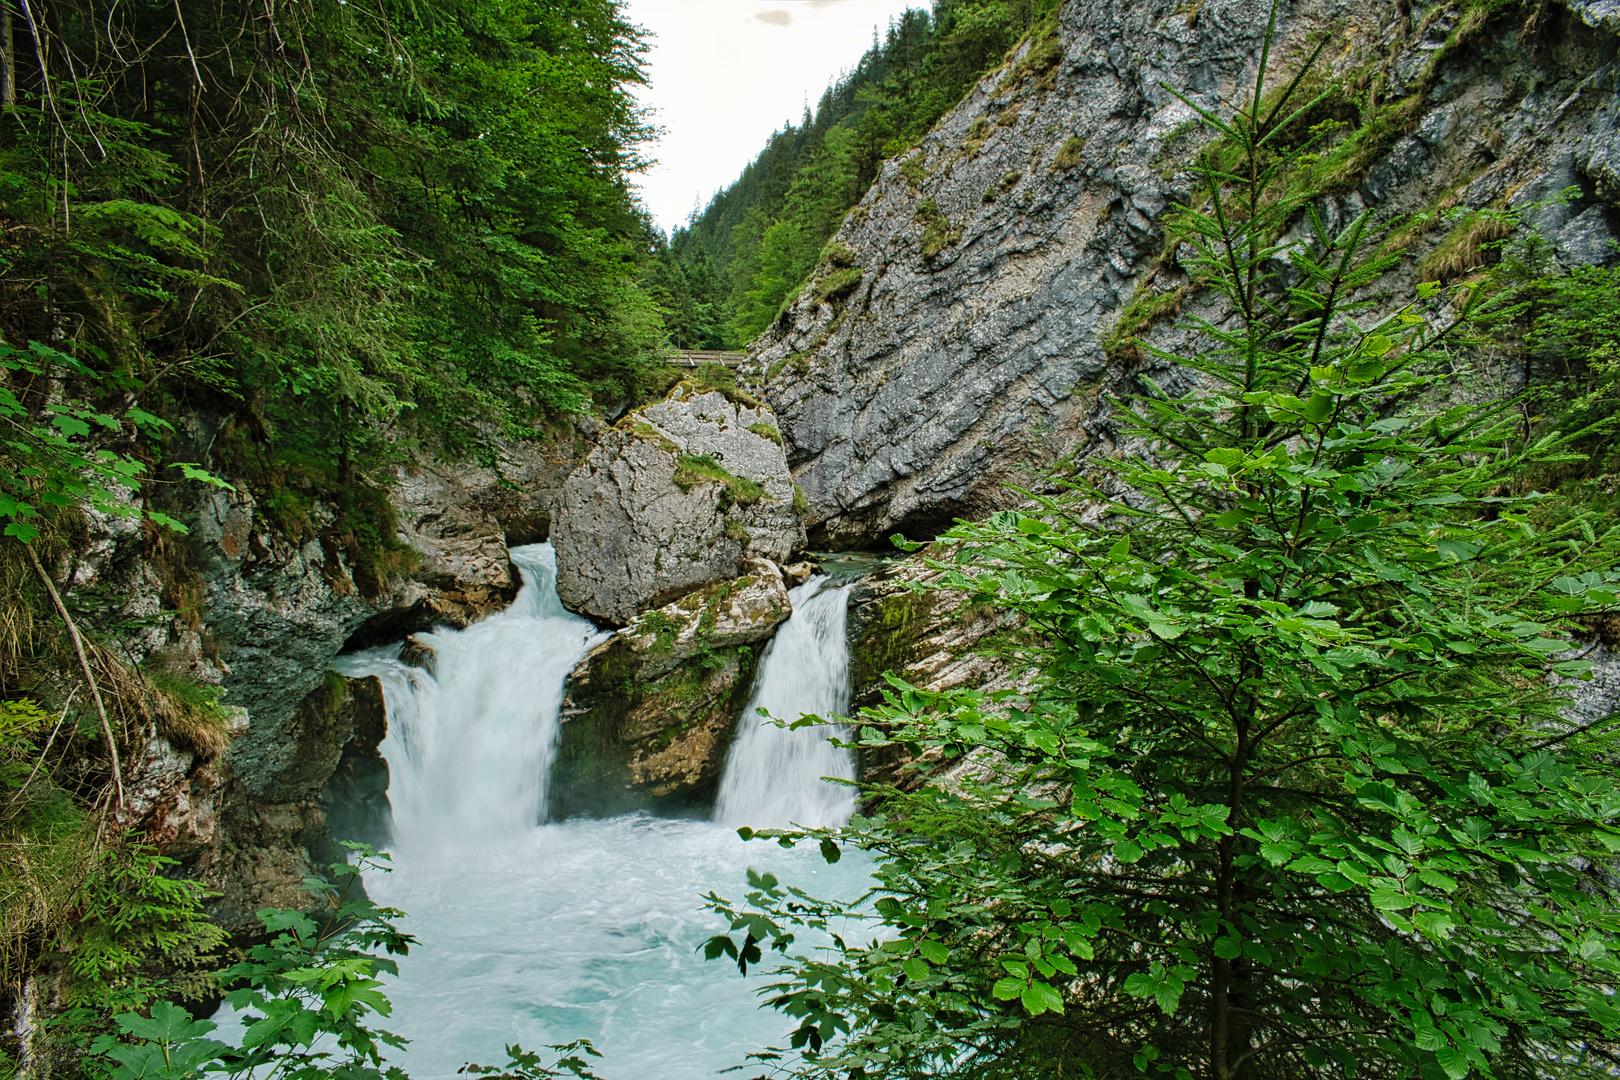 Stromboding Wasserfall